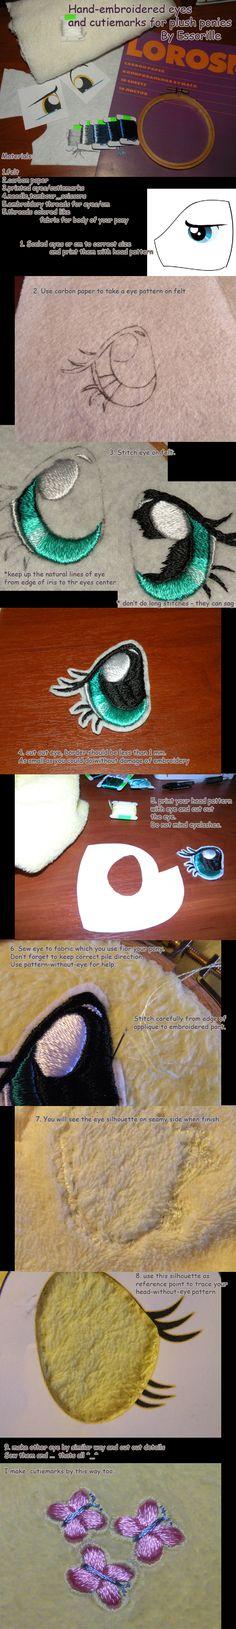 hand-embroidered plush eyes tutorial by *Essorille on deviantART